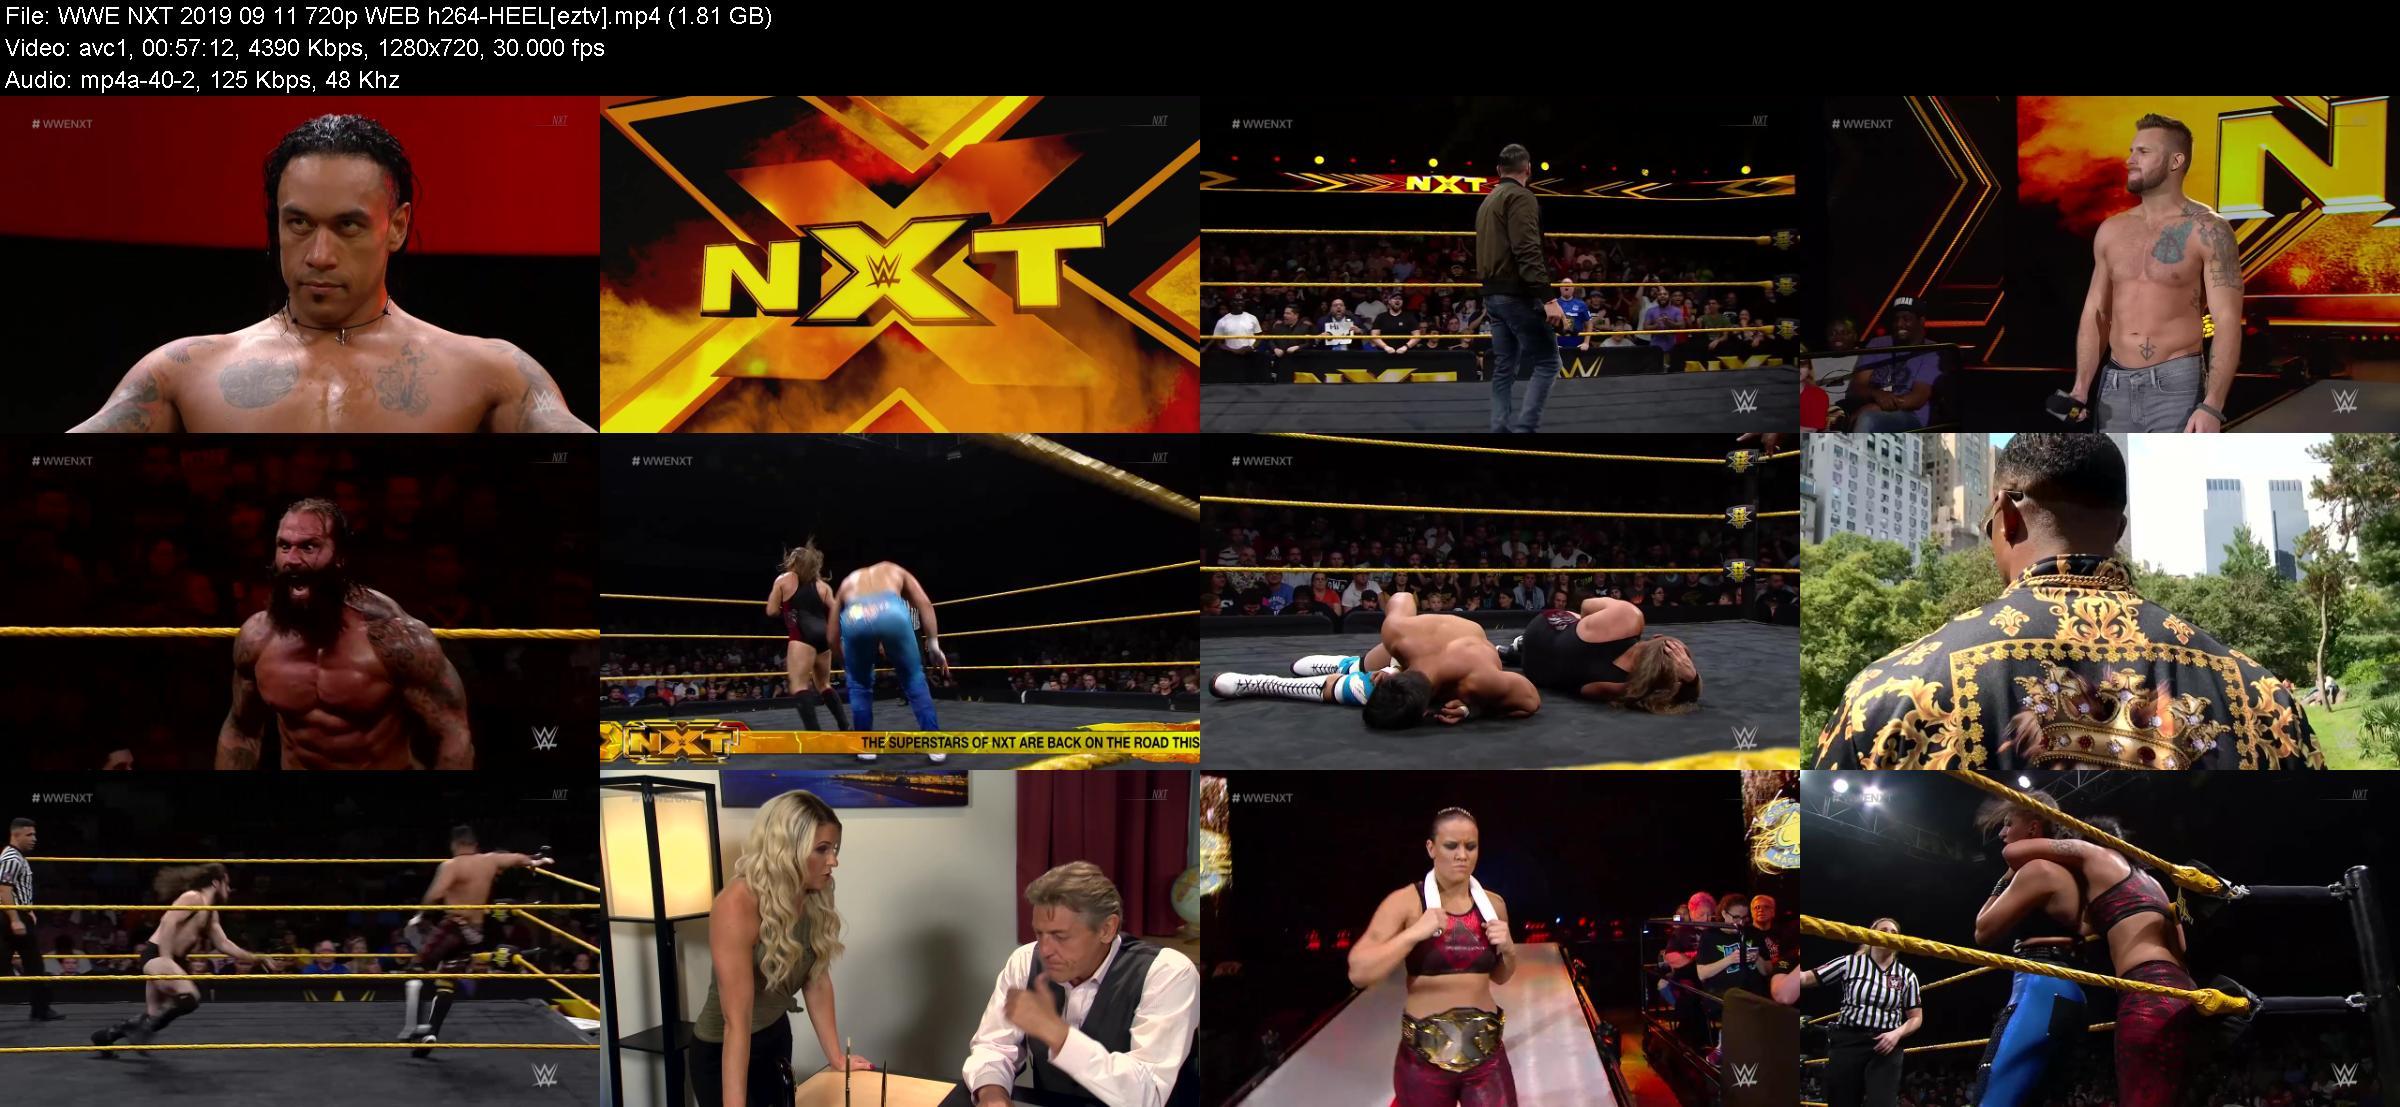 WWE NXT 2019 09 11 720p WEB h264-HEEL